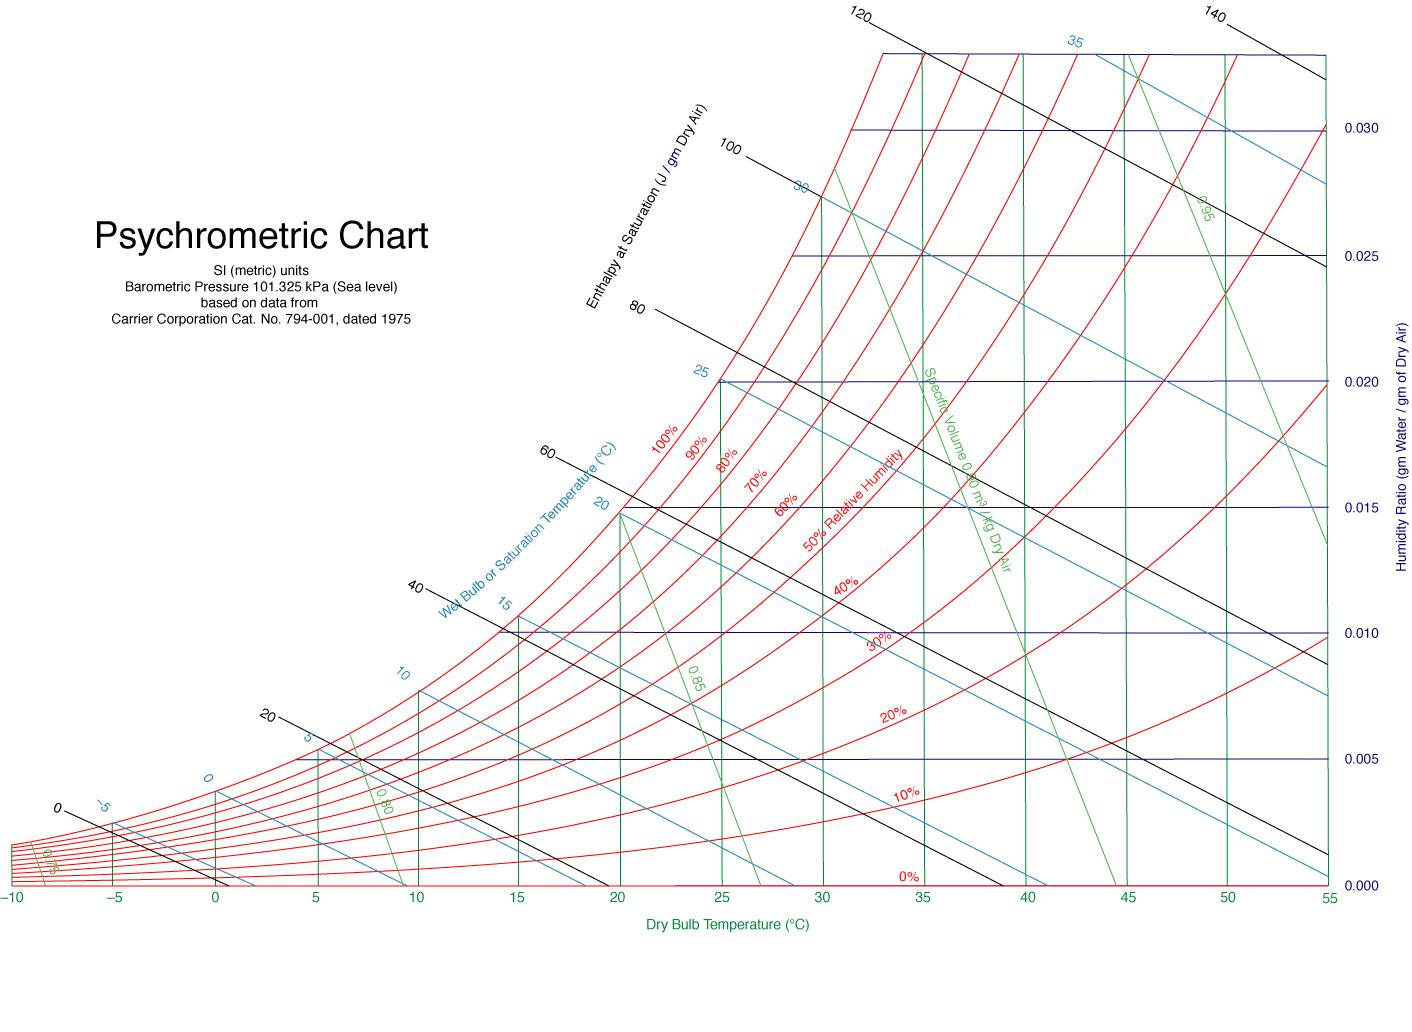 Sample psychrometric chart